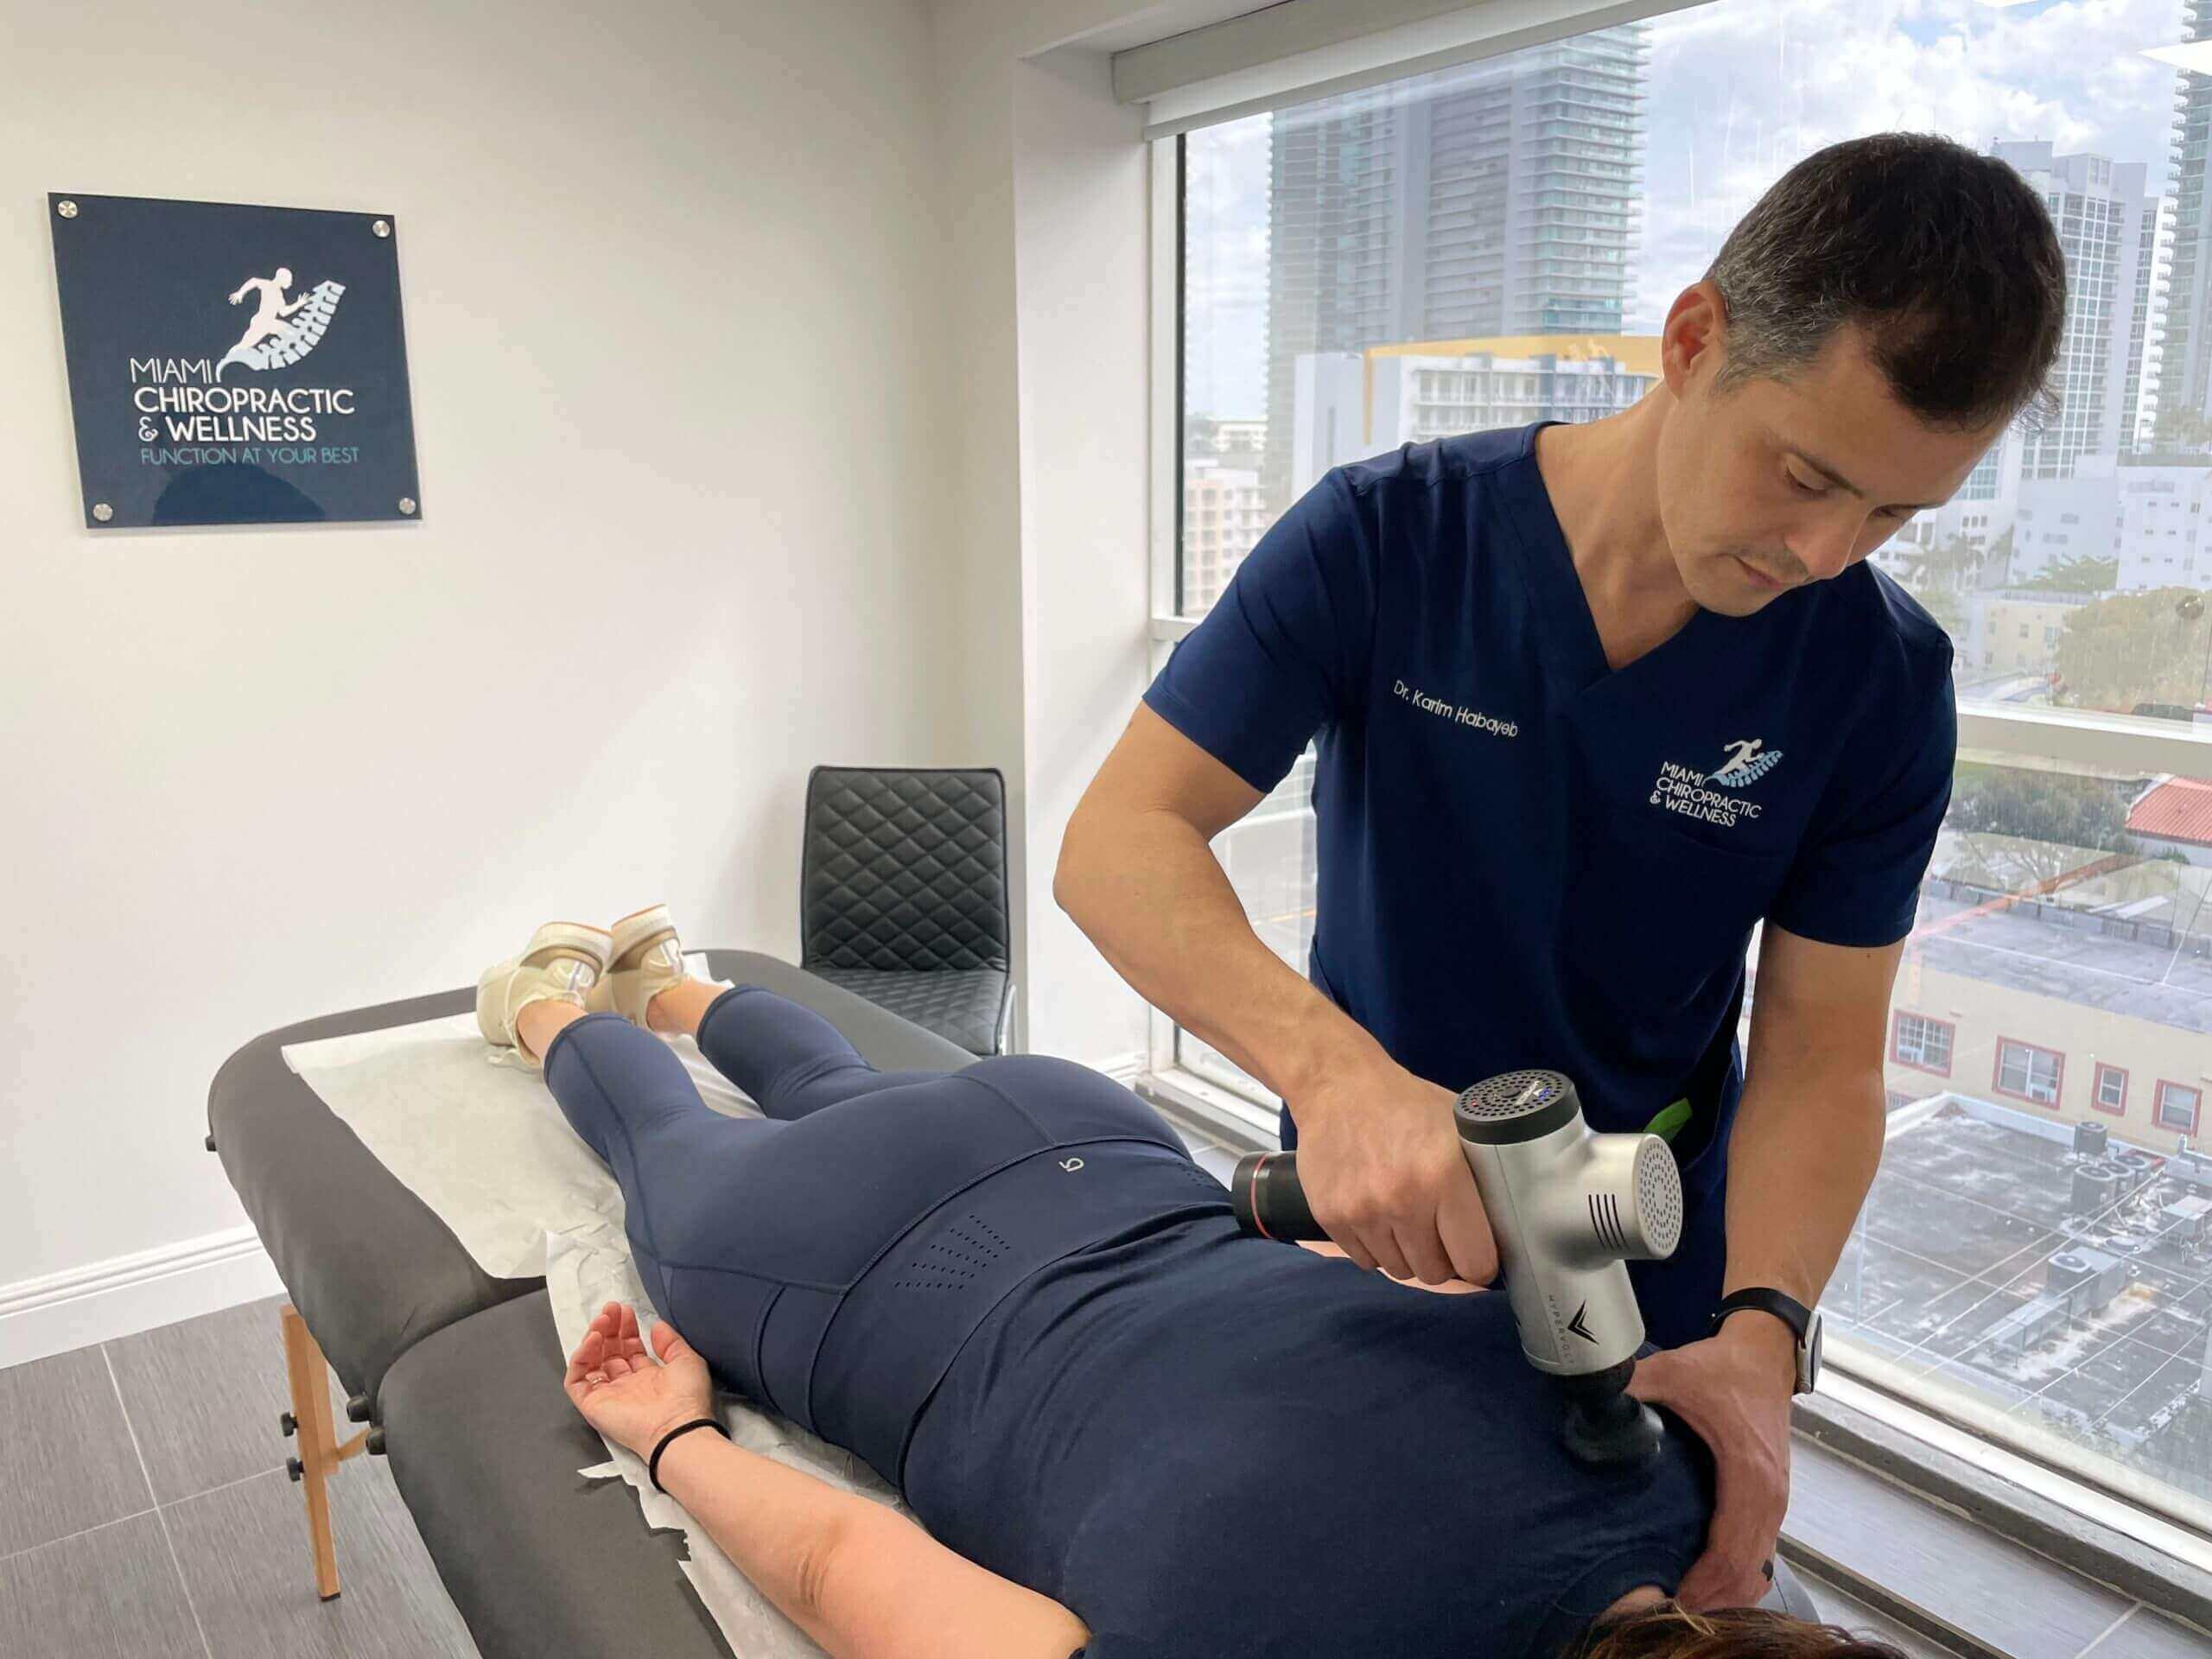 miami chiropractic wellness - treatments